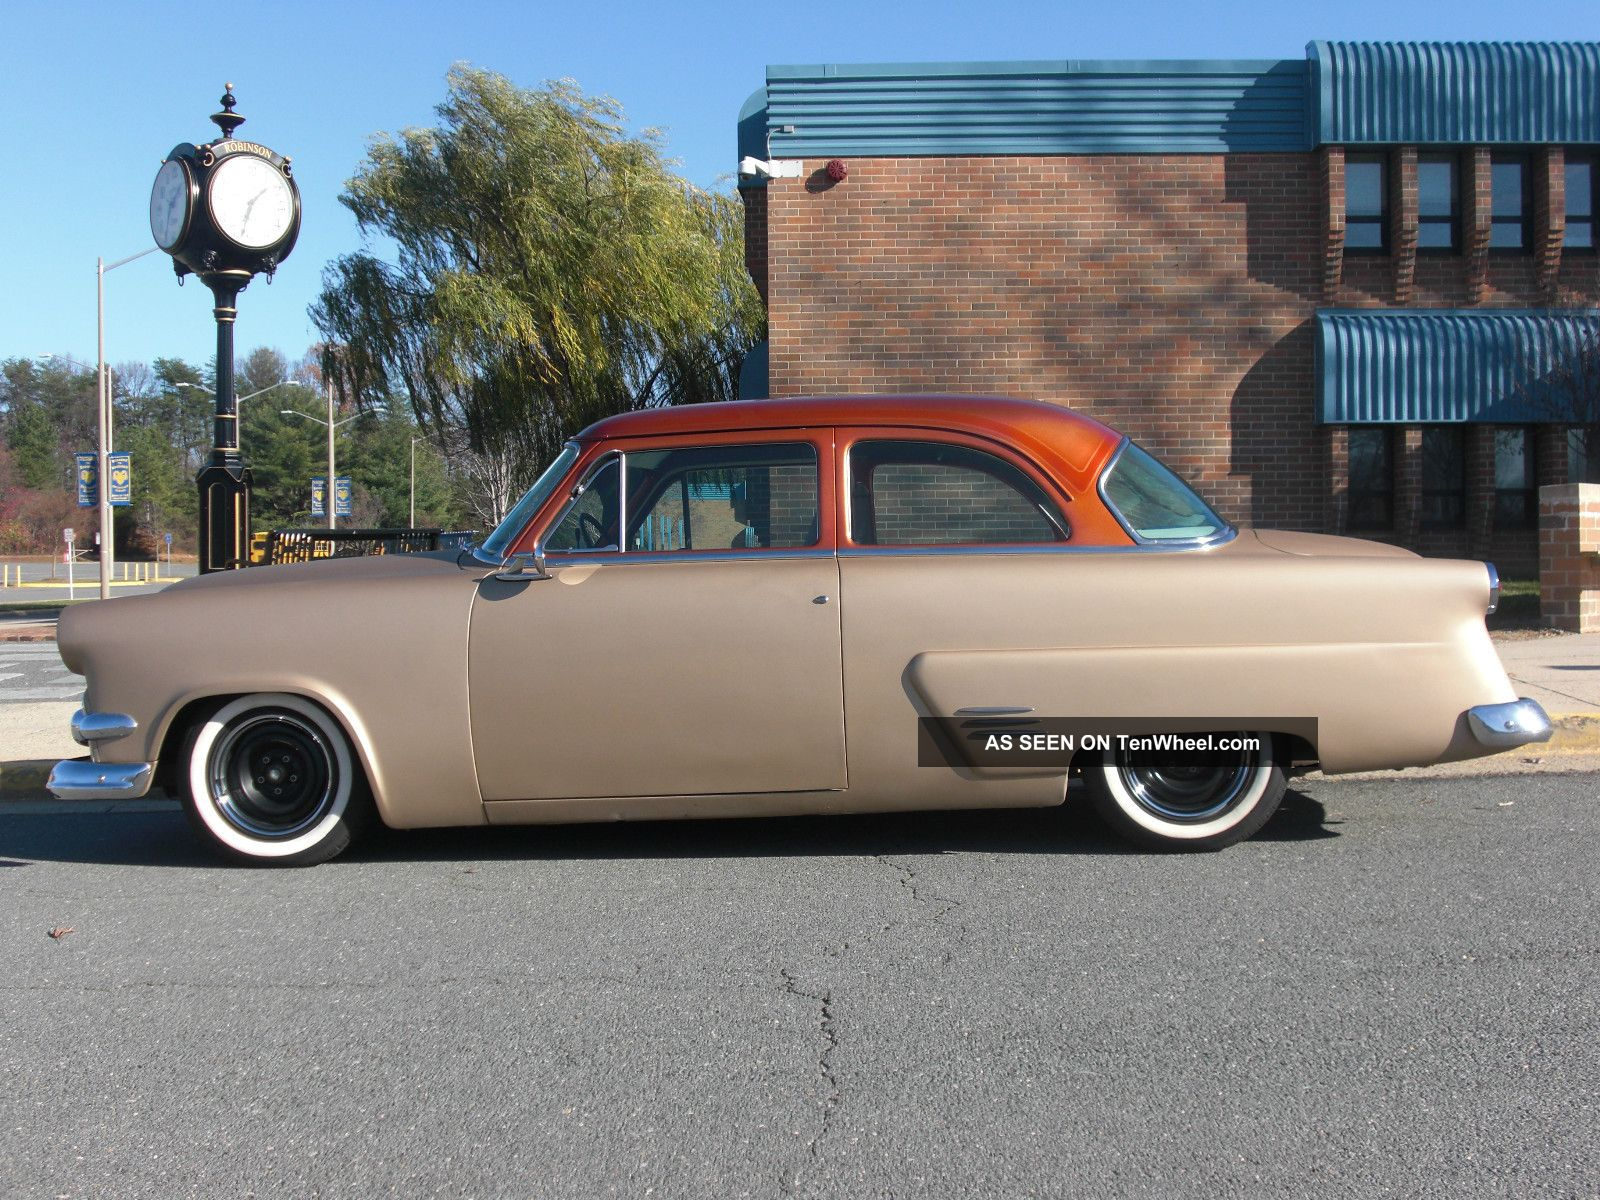 1954 Ford Customline 2d Sedan Hot Rod Mild Custom Other photo